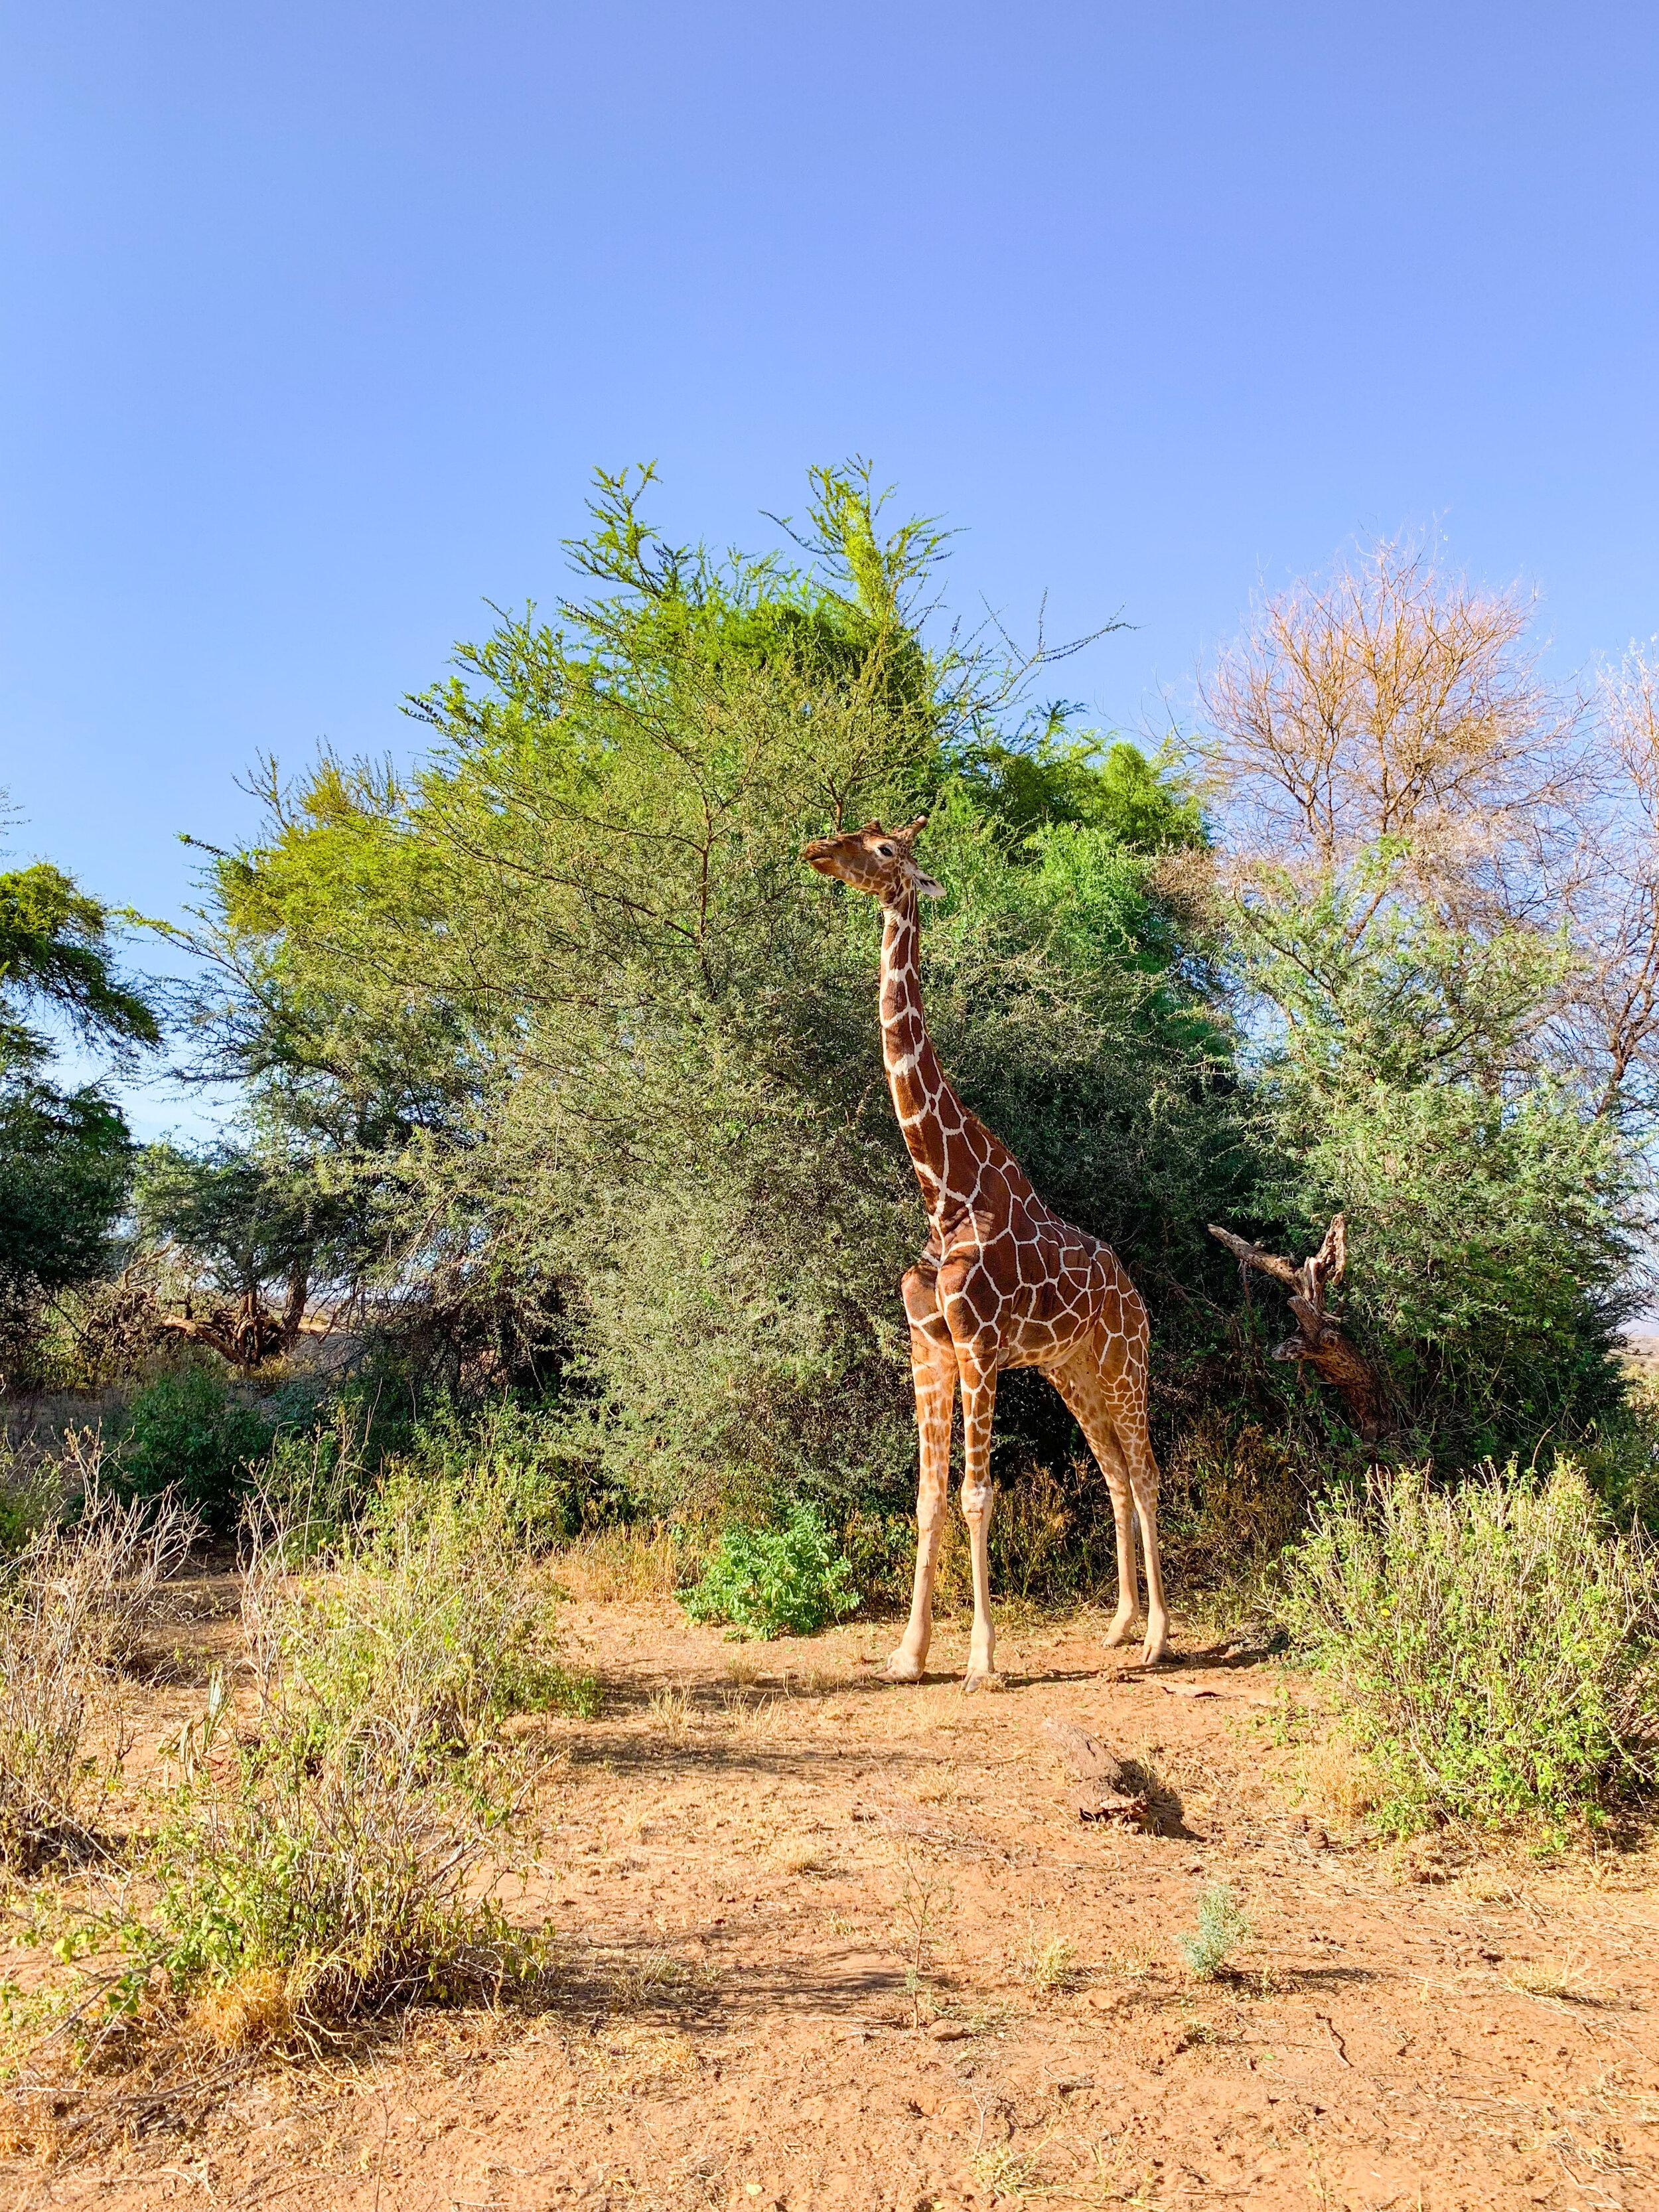 Reticulated Giraffe having Breakfast